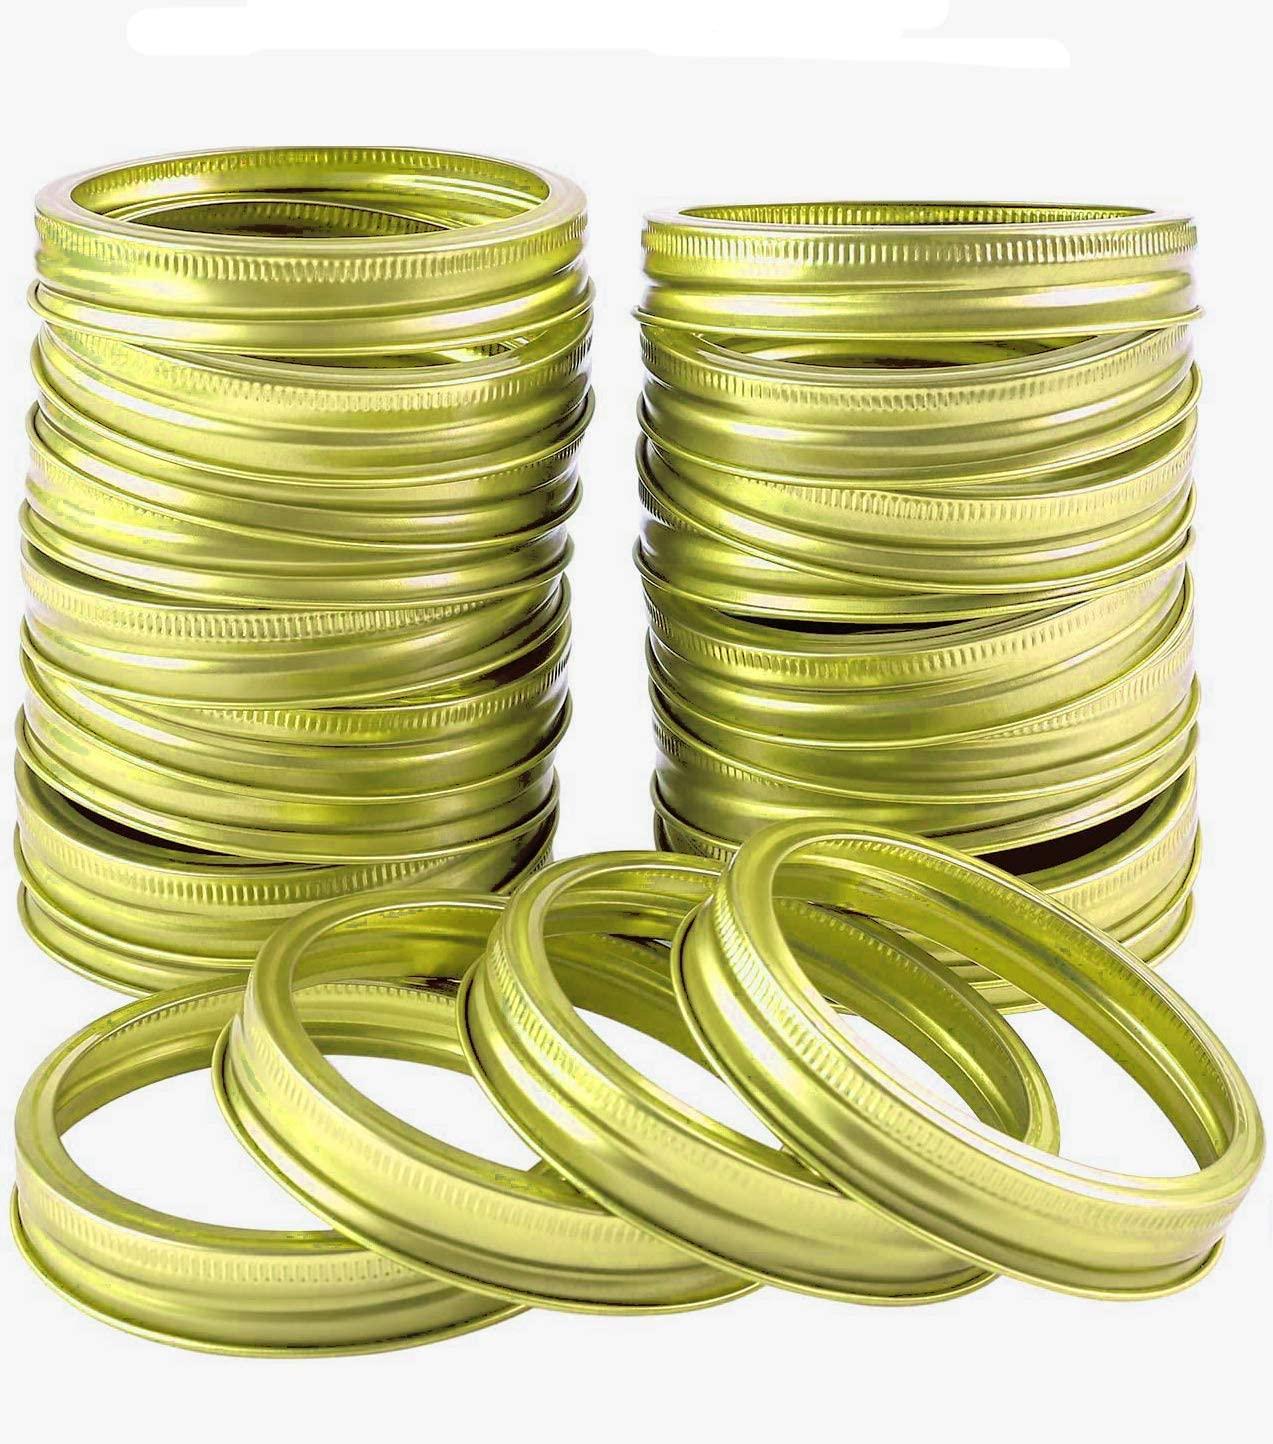 Kampo 24 Pack Regular Mouth Mason Jar Lids Bands,Reusable Metal Split-type Sealing Lids Ring for Canning Jars DIY Mason Jar Lids (70 mm, Gold)